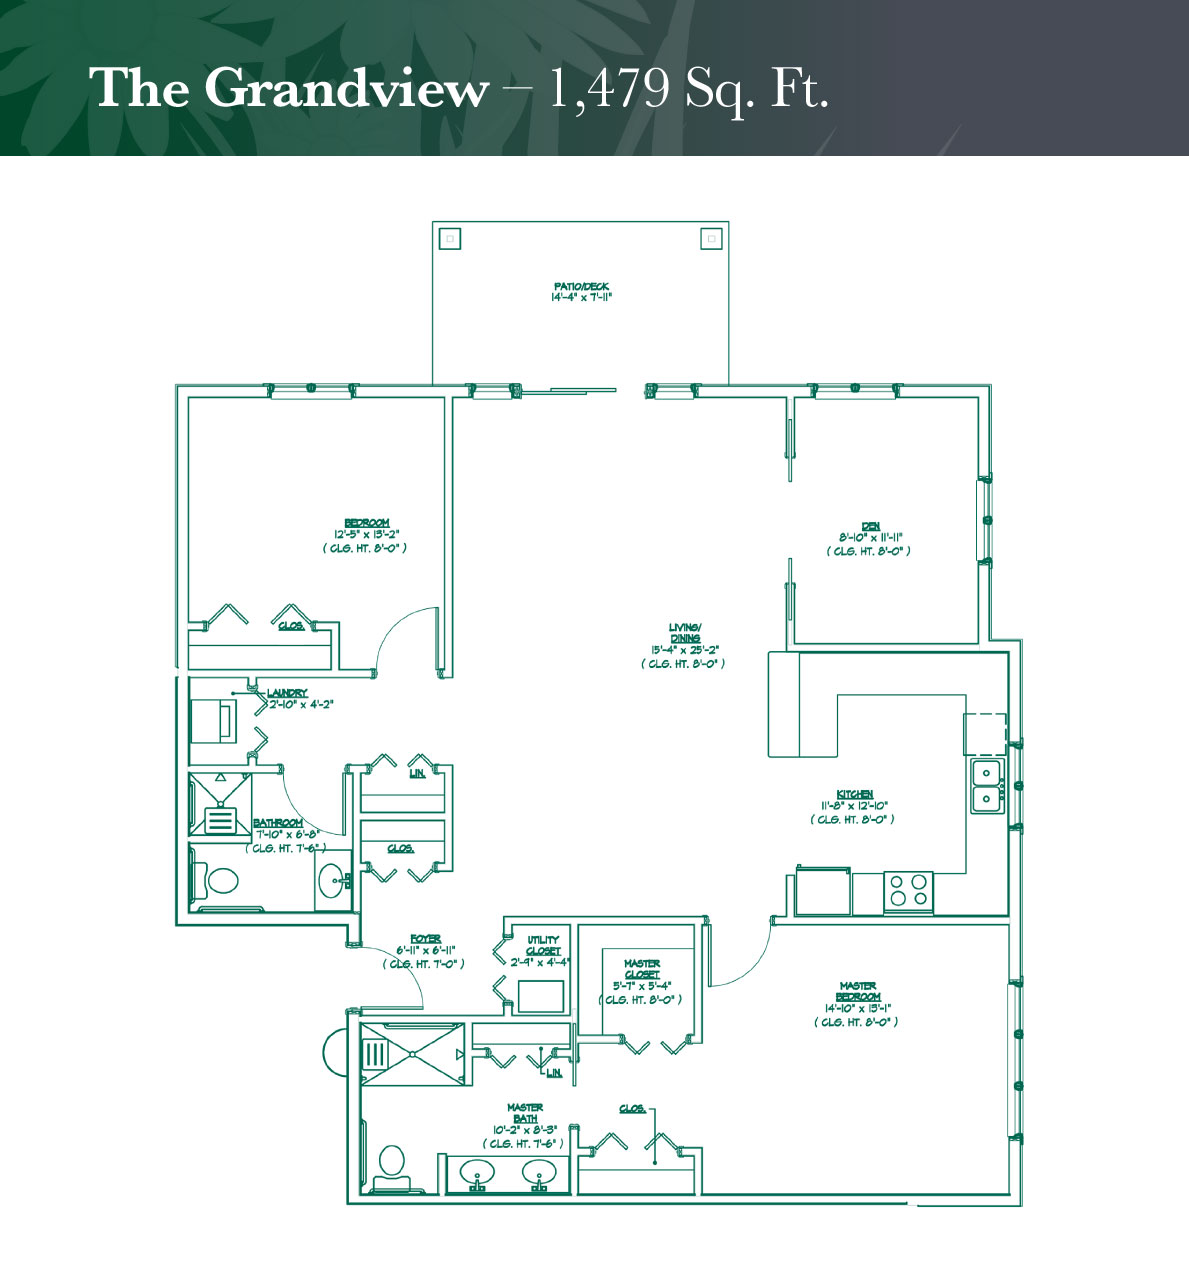 The Grandview Floorplan